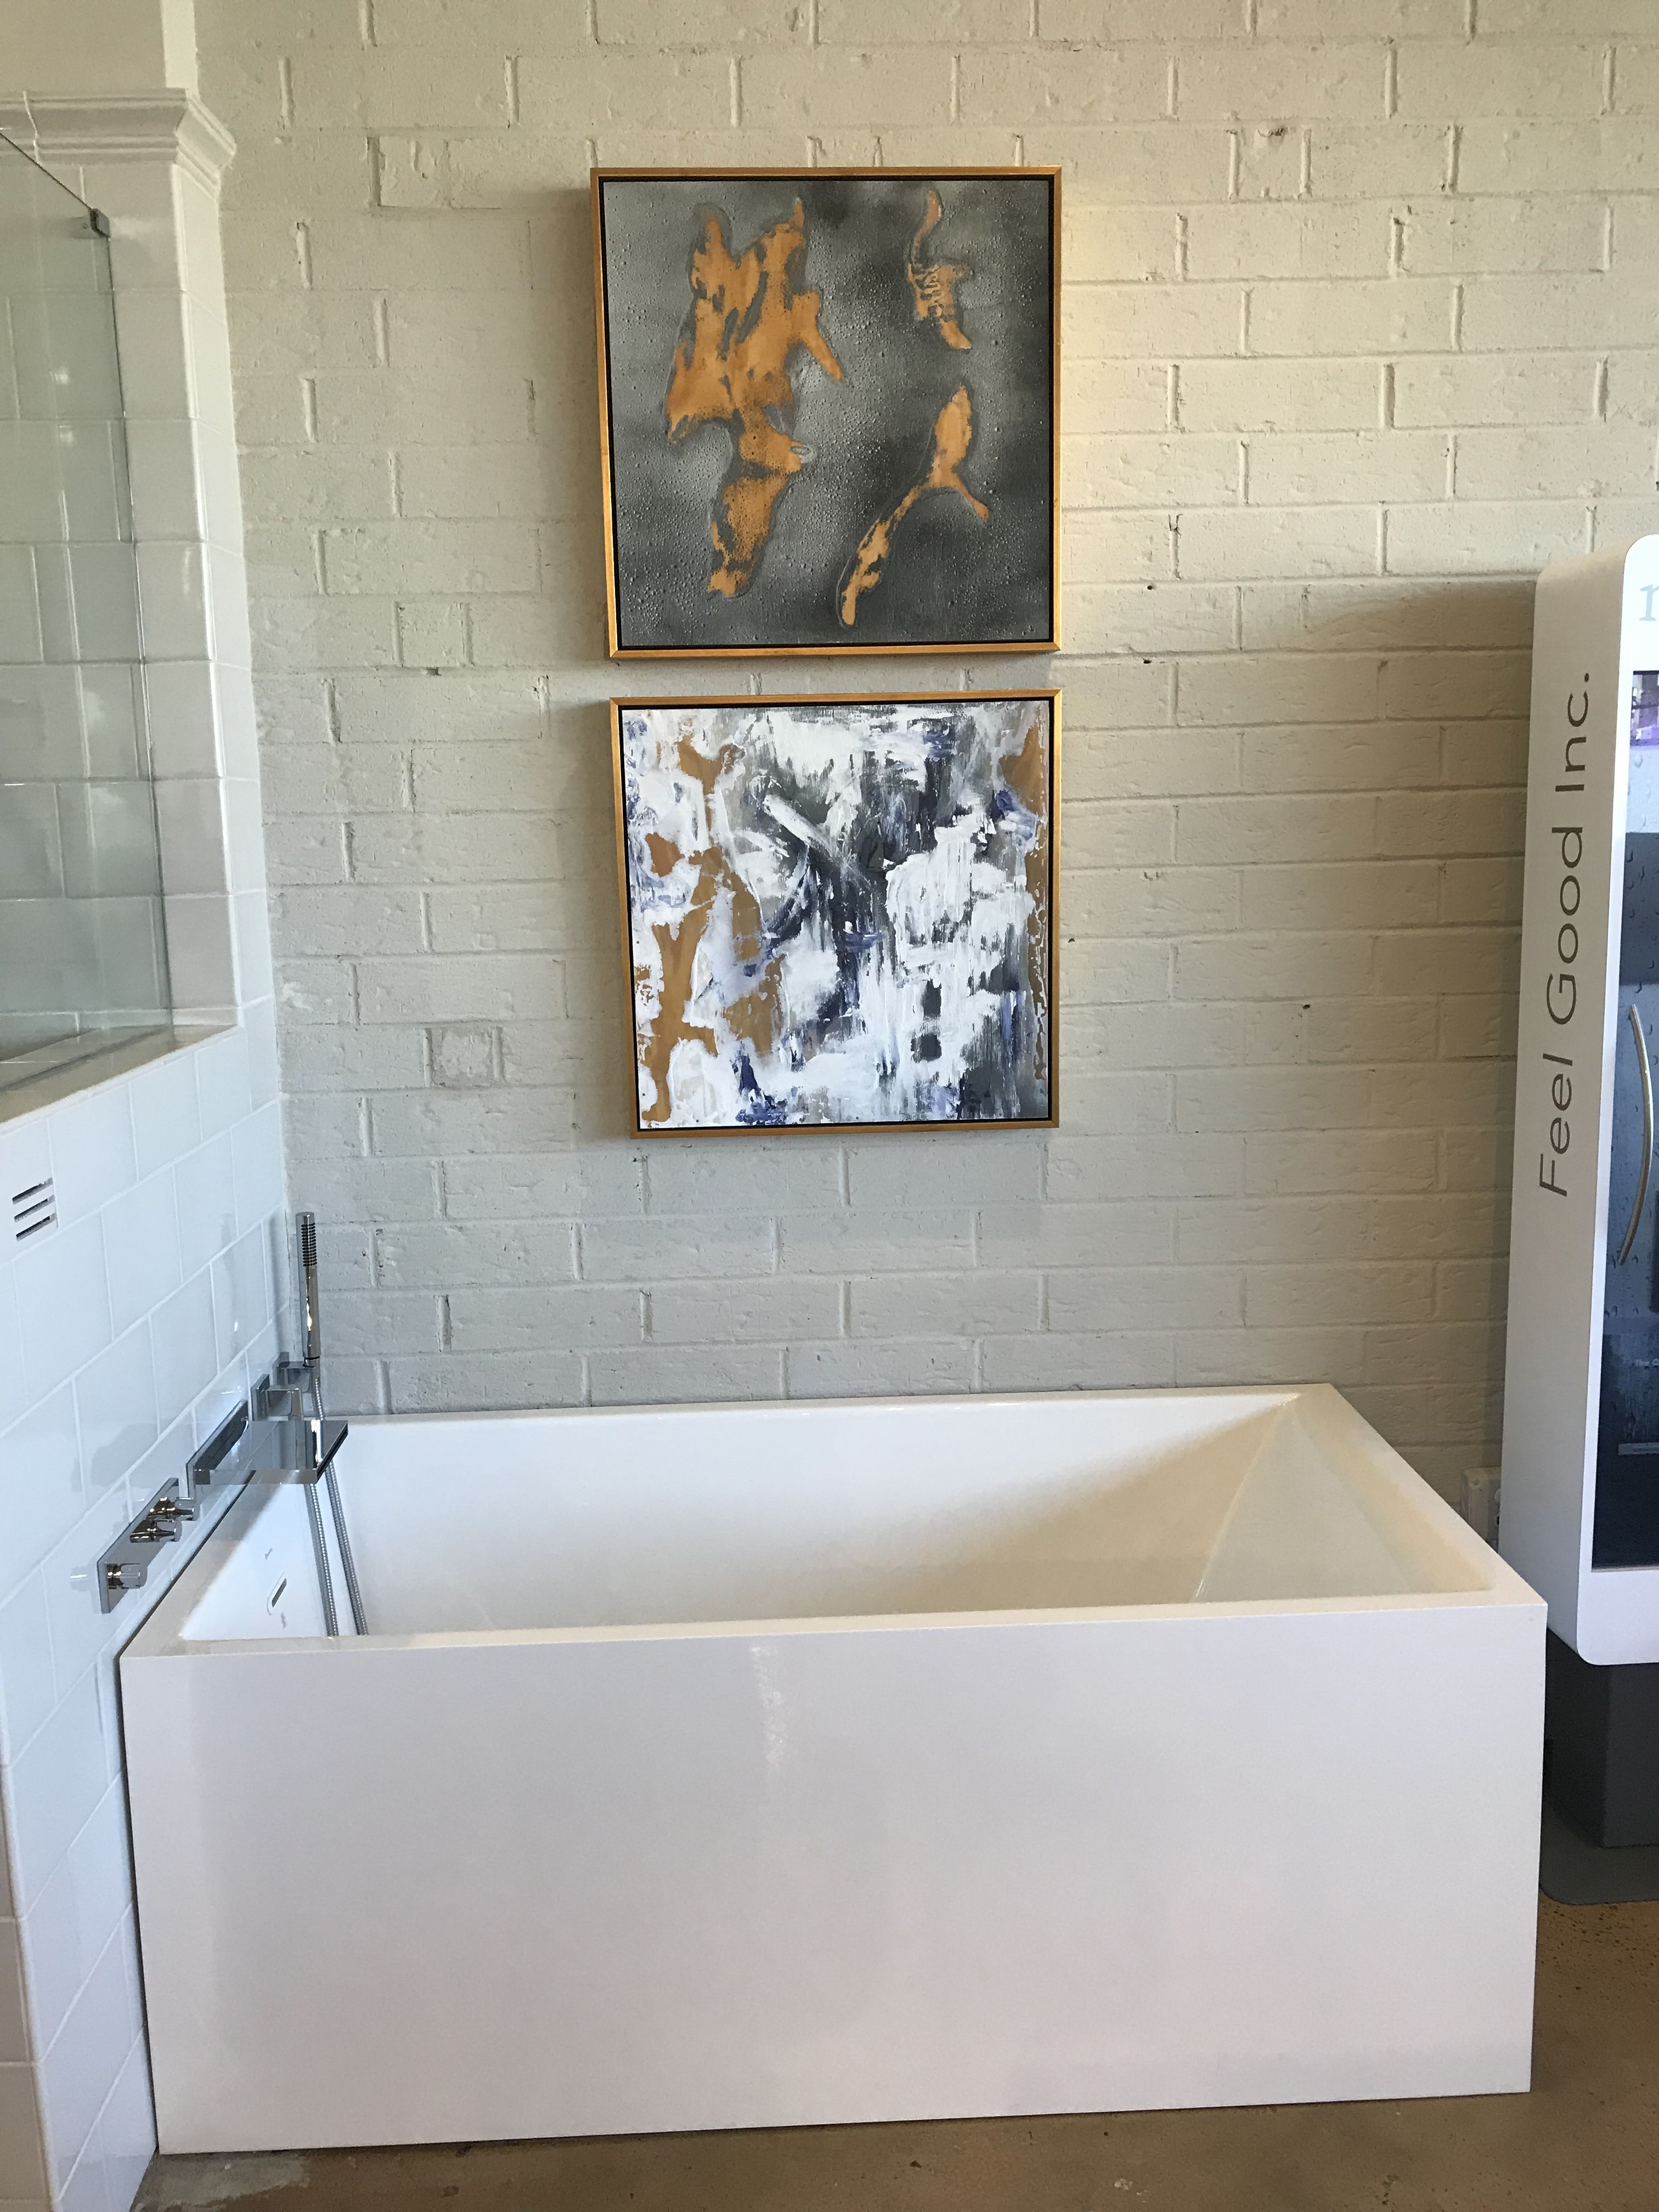 Surprising Our Live Bain Ultra Nokori Tub With Dornbracht Fittings Home Interior And Landscaping Ferensignezvosmurscom